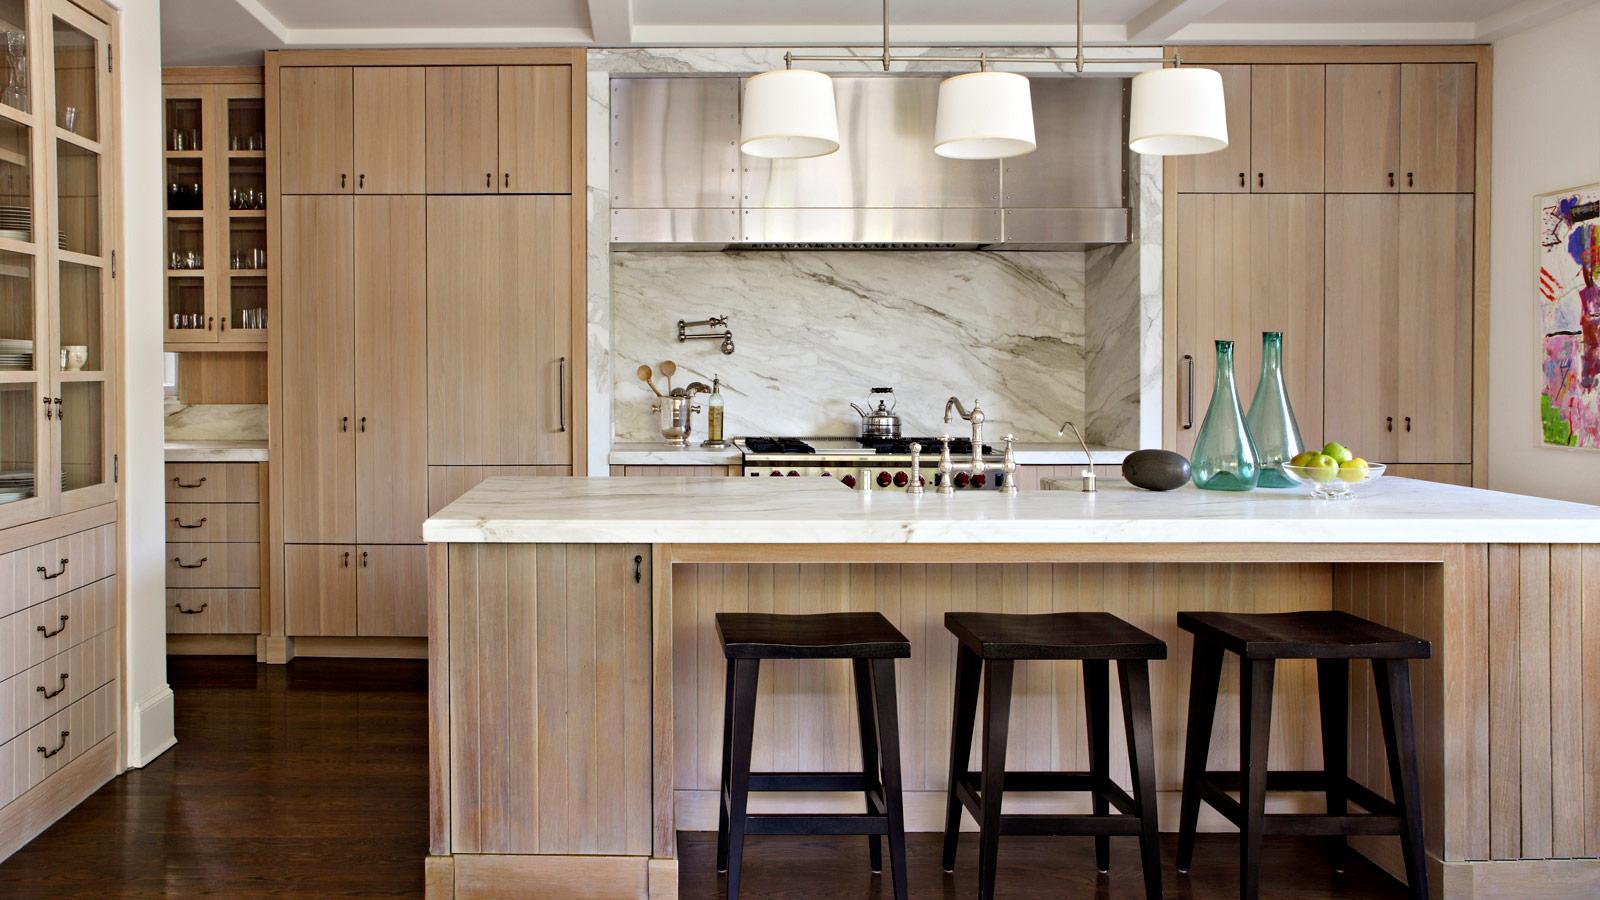 kitchen cabinets wood white beadboard kitchen cabinets Of Kitchens Traditional Light Wood Kitchen Cabinets